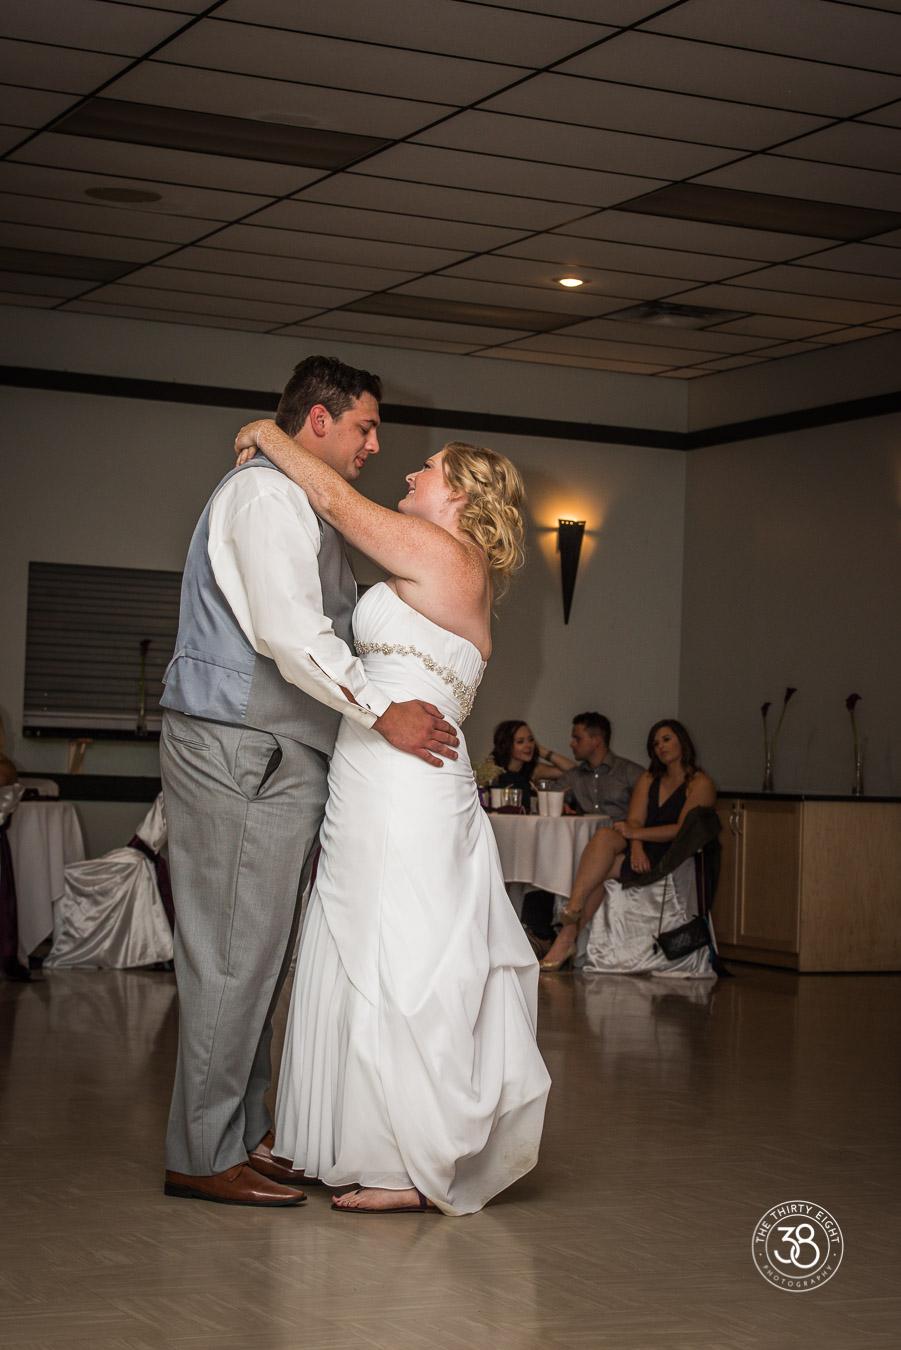 The38Photo_wedding_day_Calgary_24.jpg